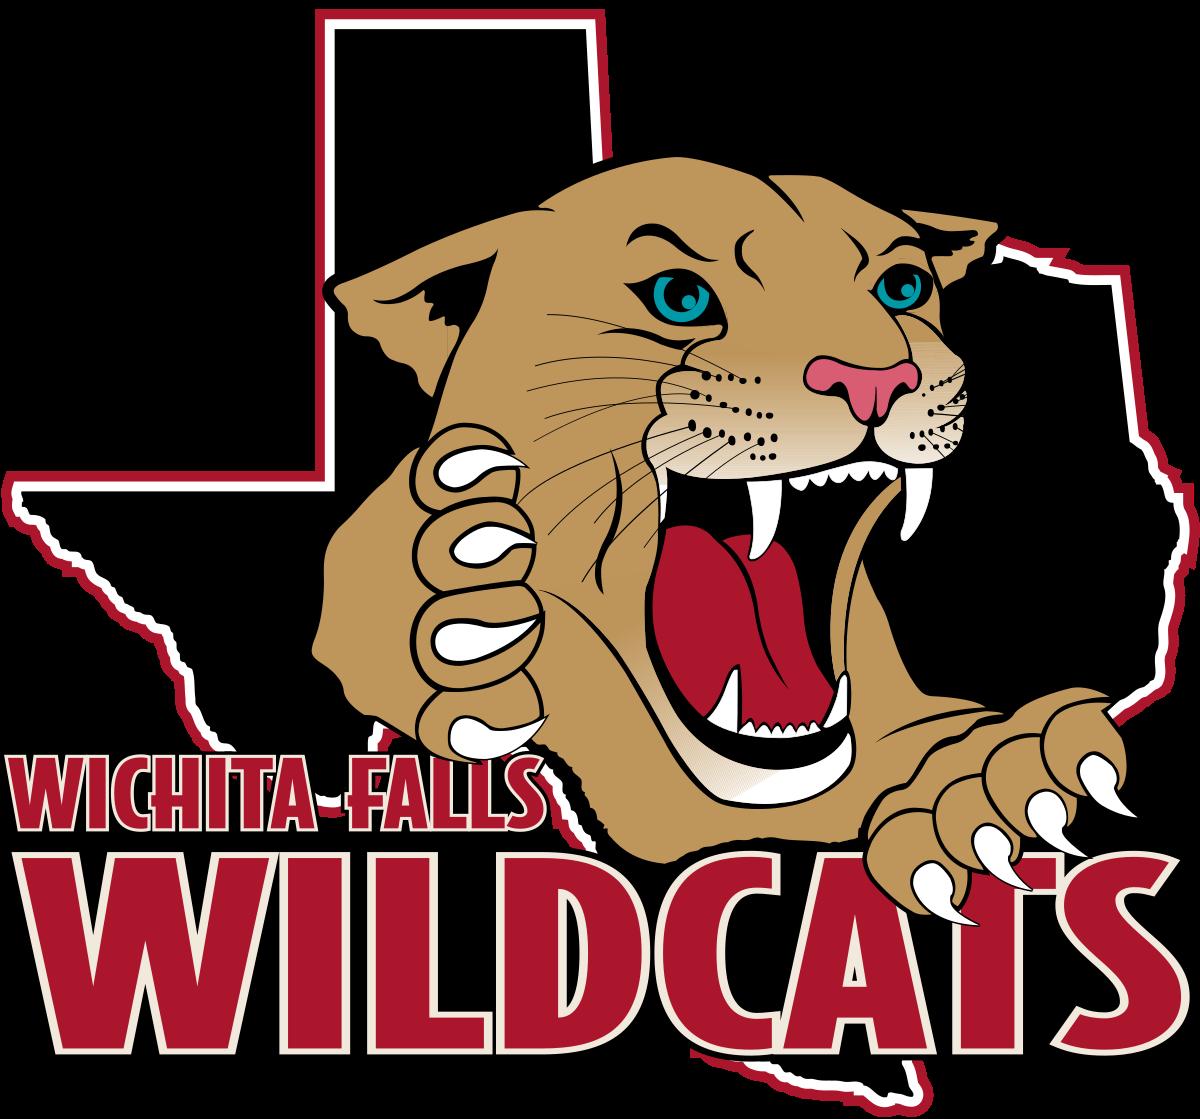 Wichita falls clipart image transparent Wichita Falls Wildcats - Wikipedia image transparent